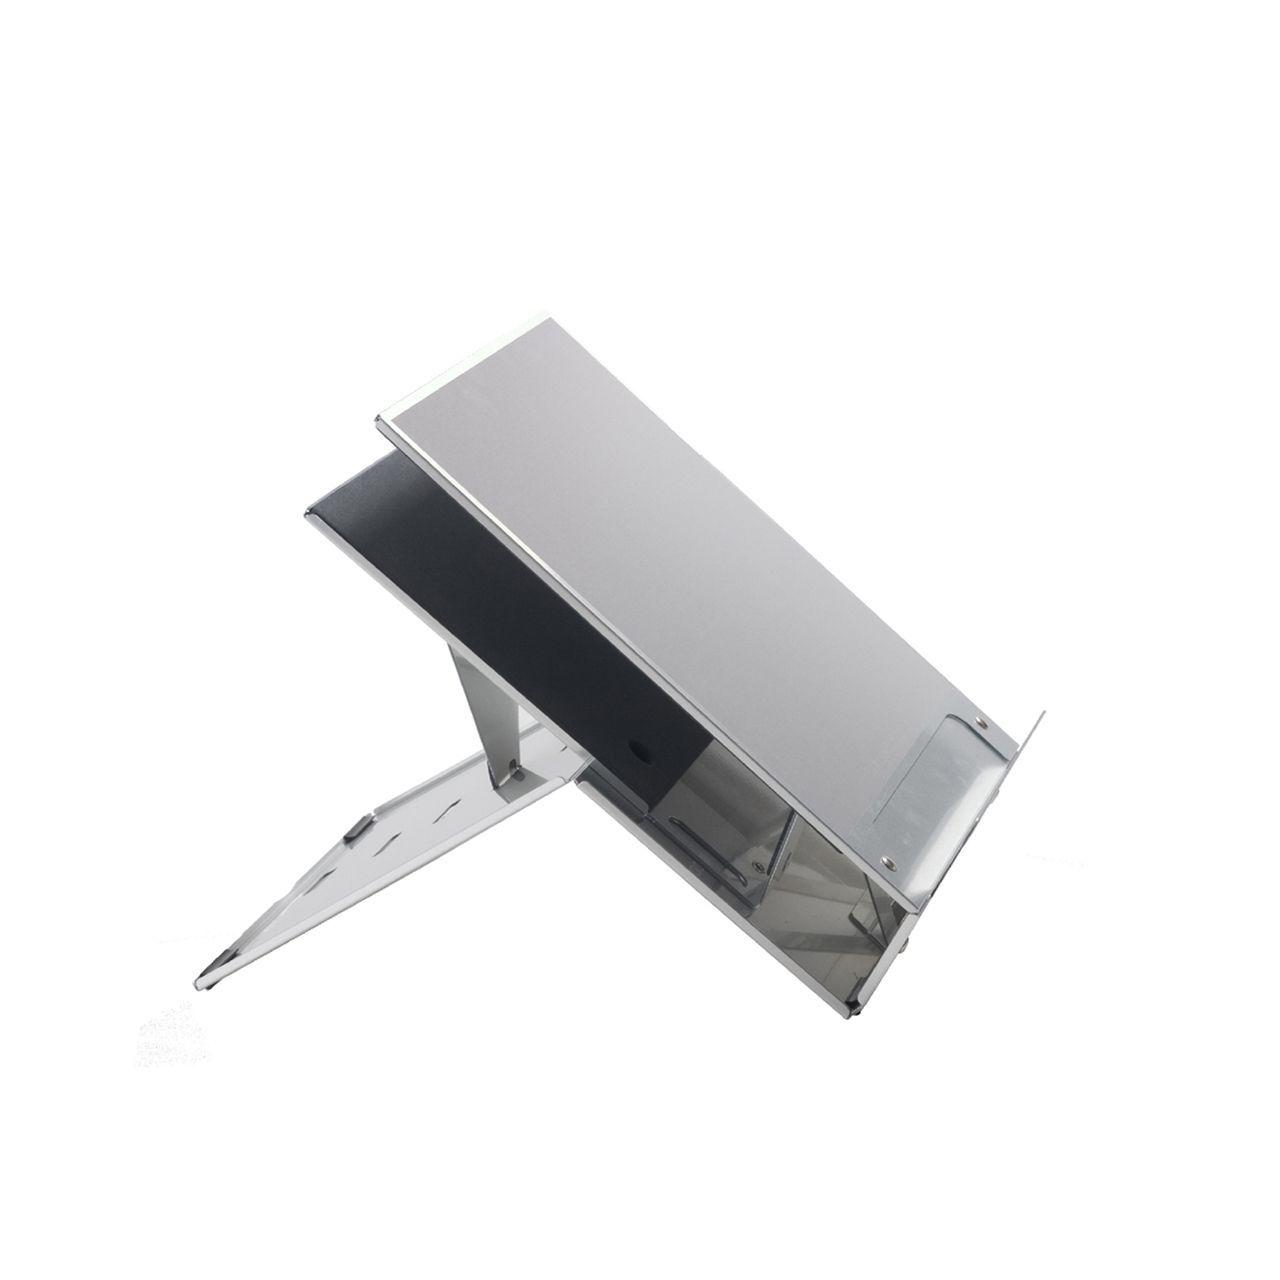 Ergo Q 220 laptophouder Zijkant